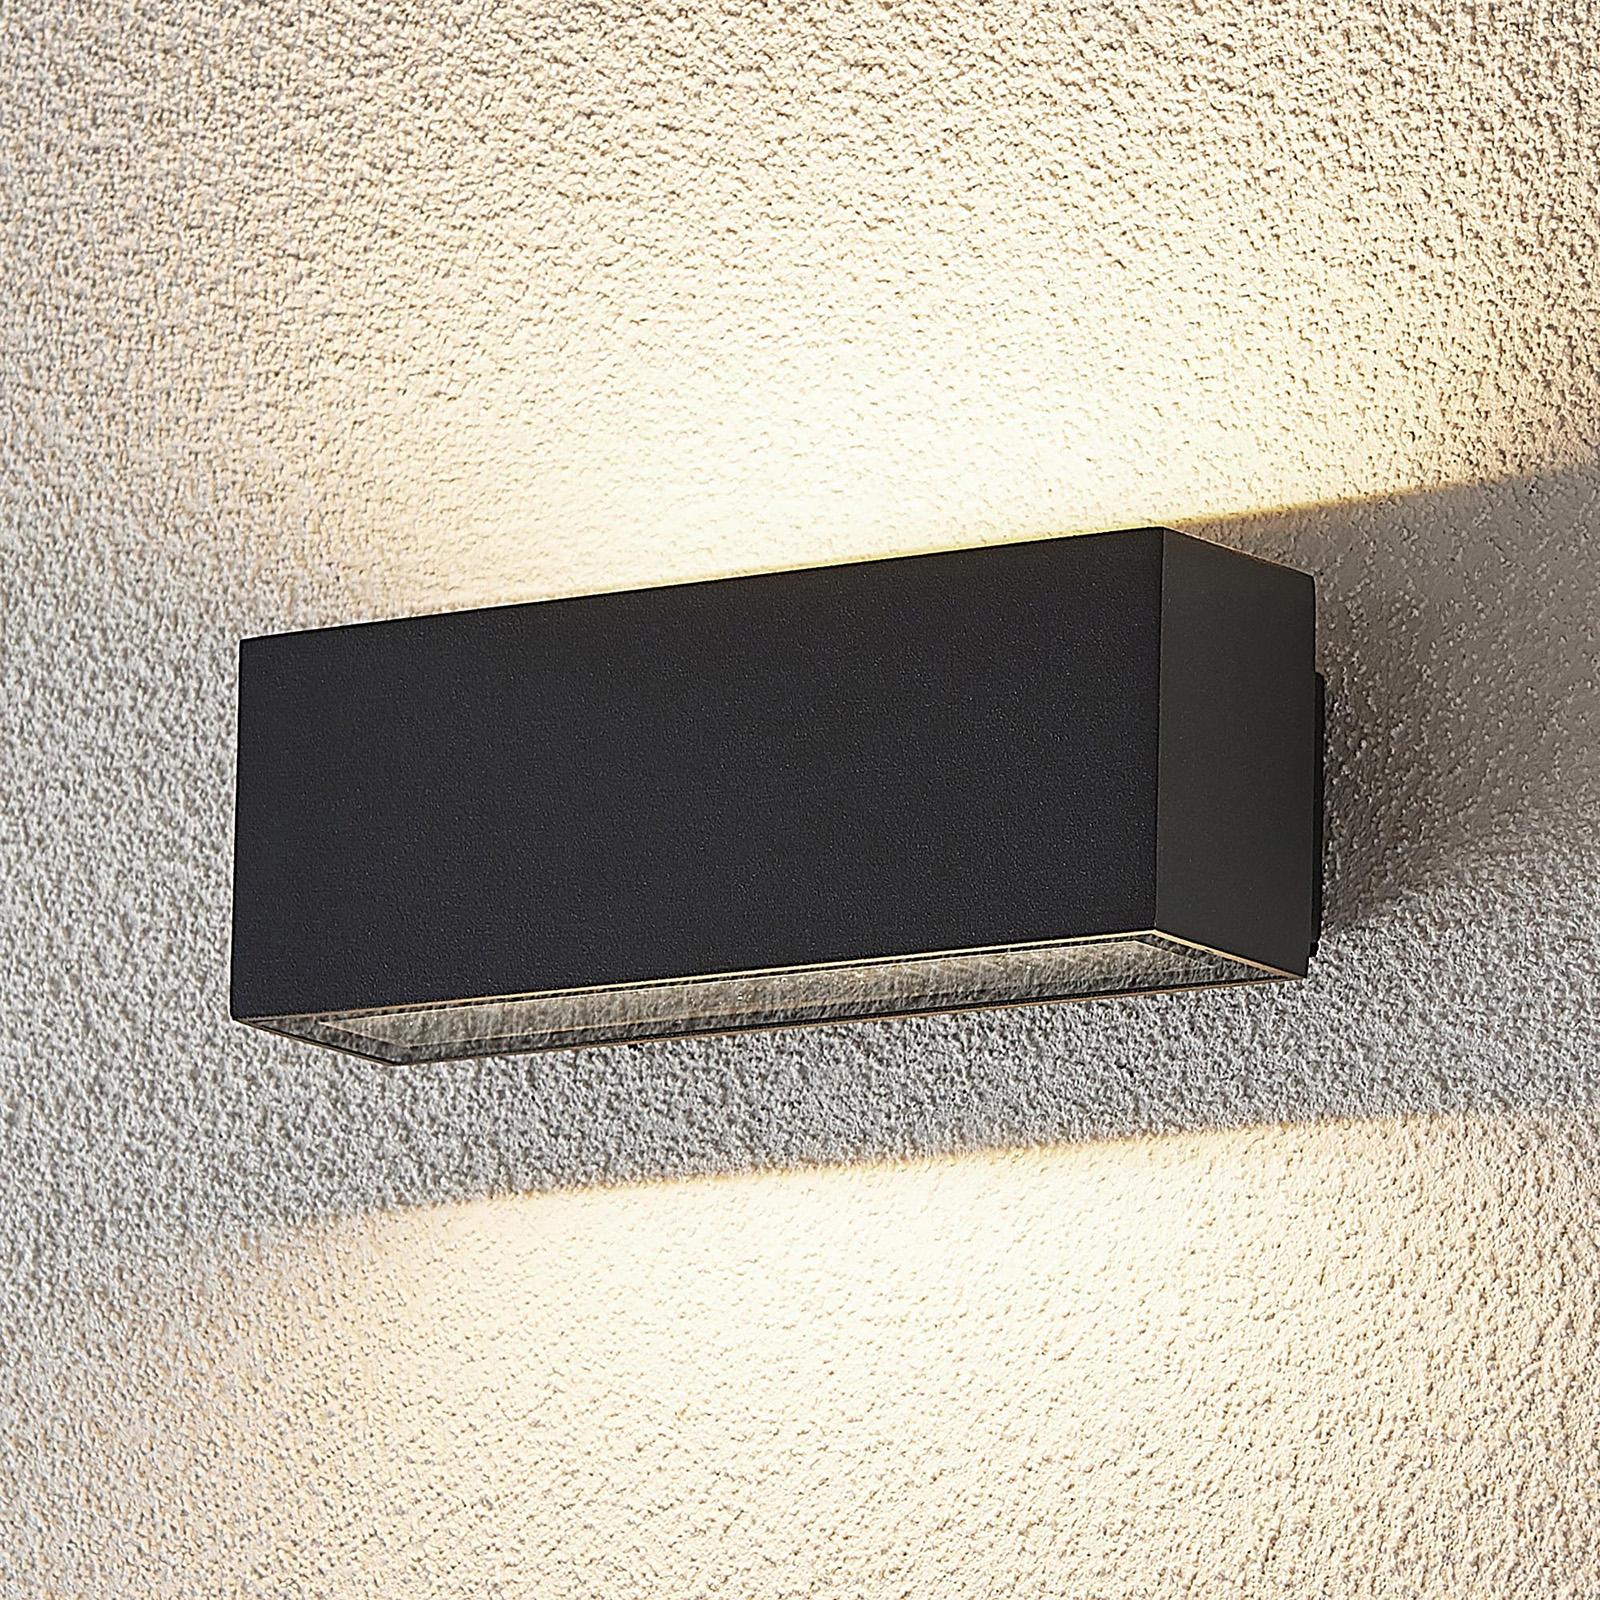 LED-Außenwandleuchte Oliver, dunkelgrau, 18 cm